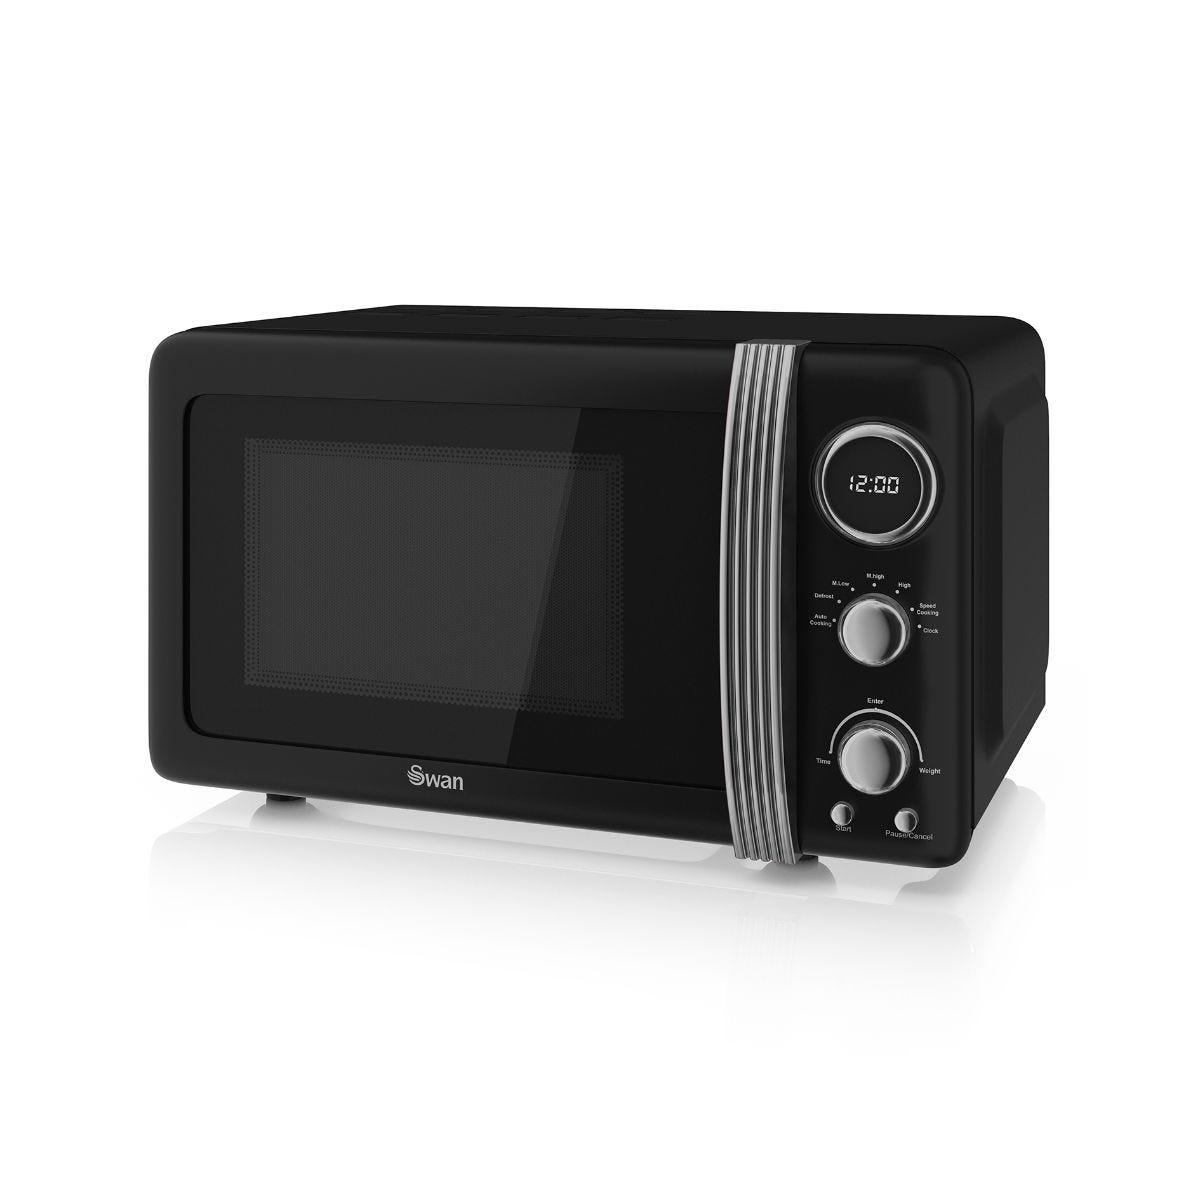 Image of 800W Retro Digital Microwave, Black